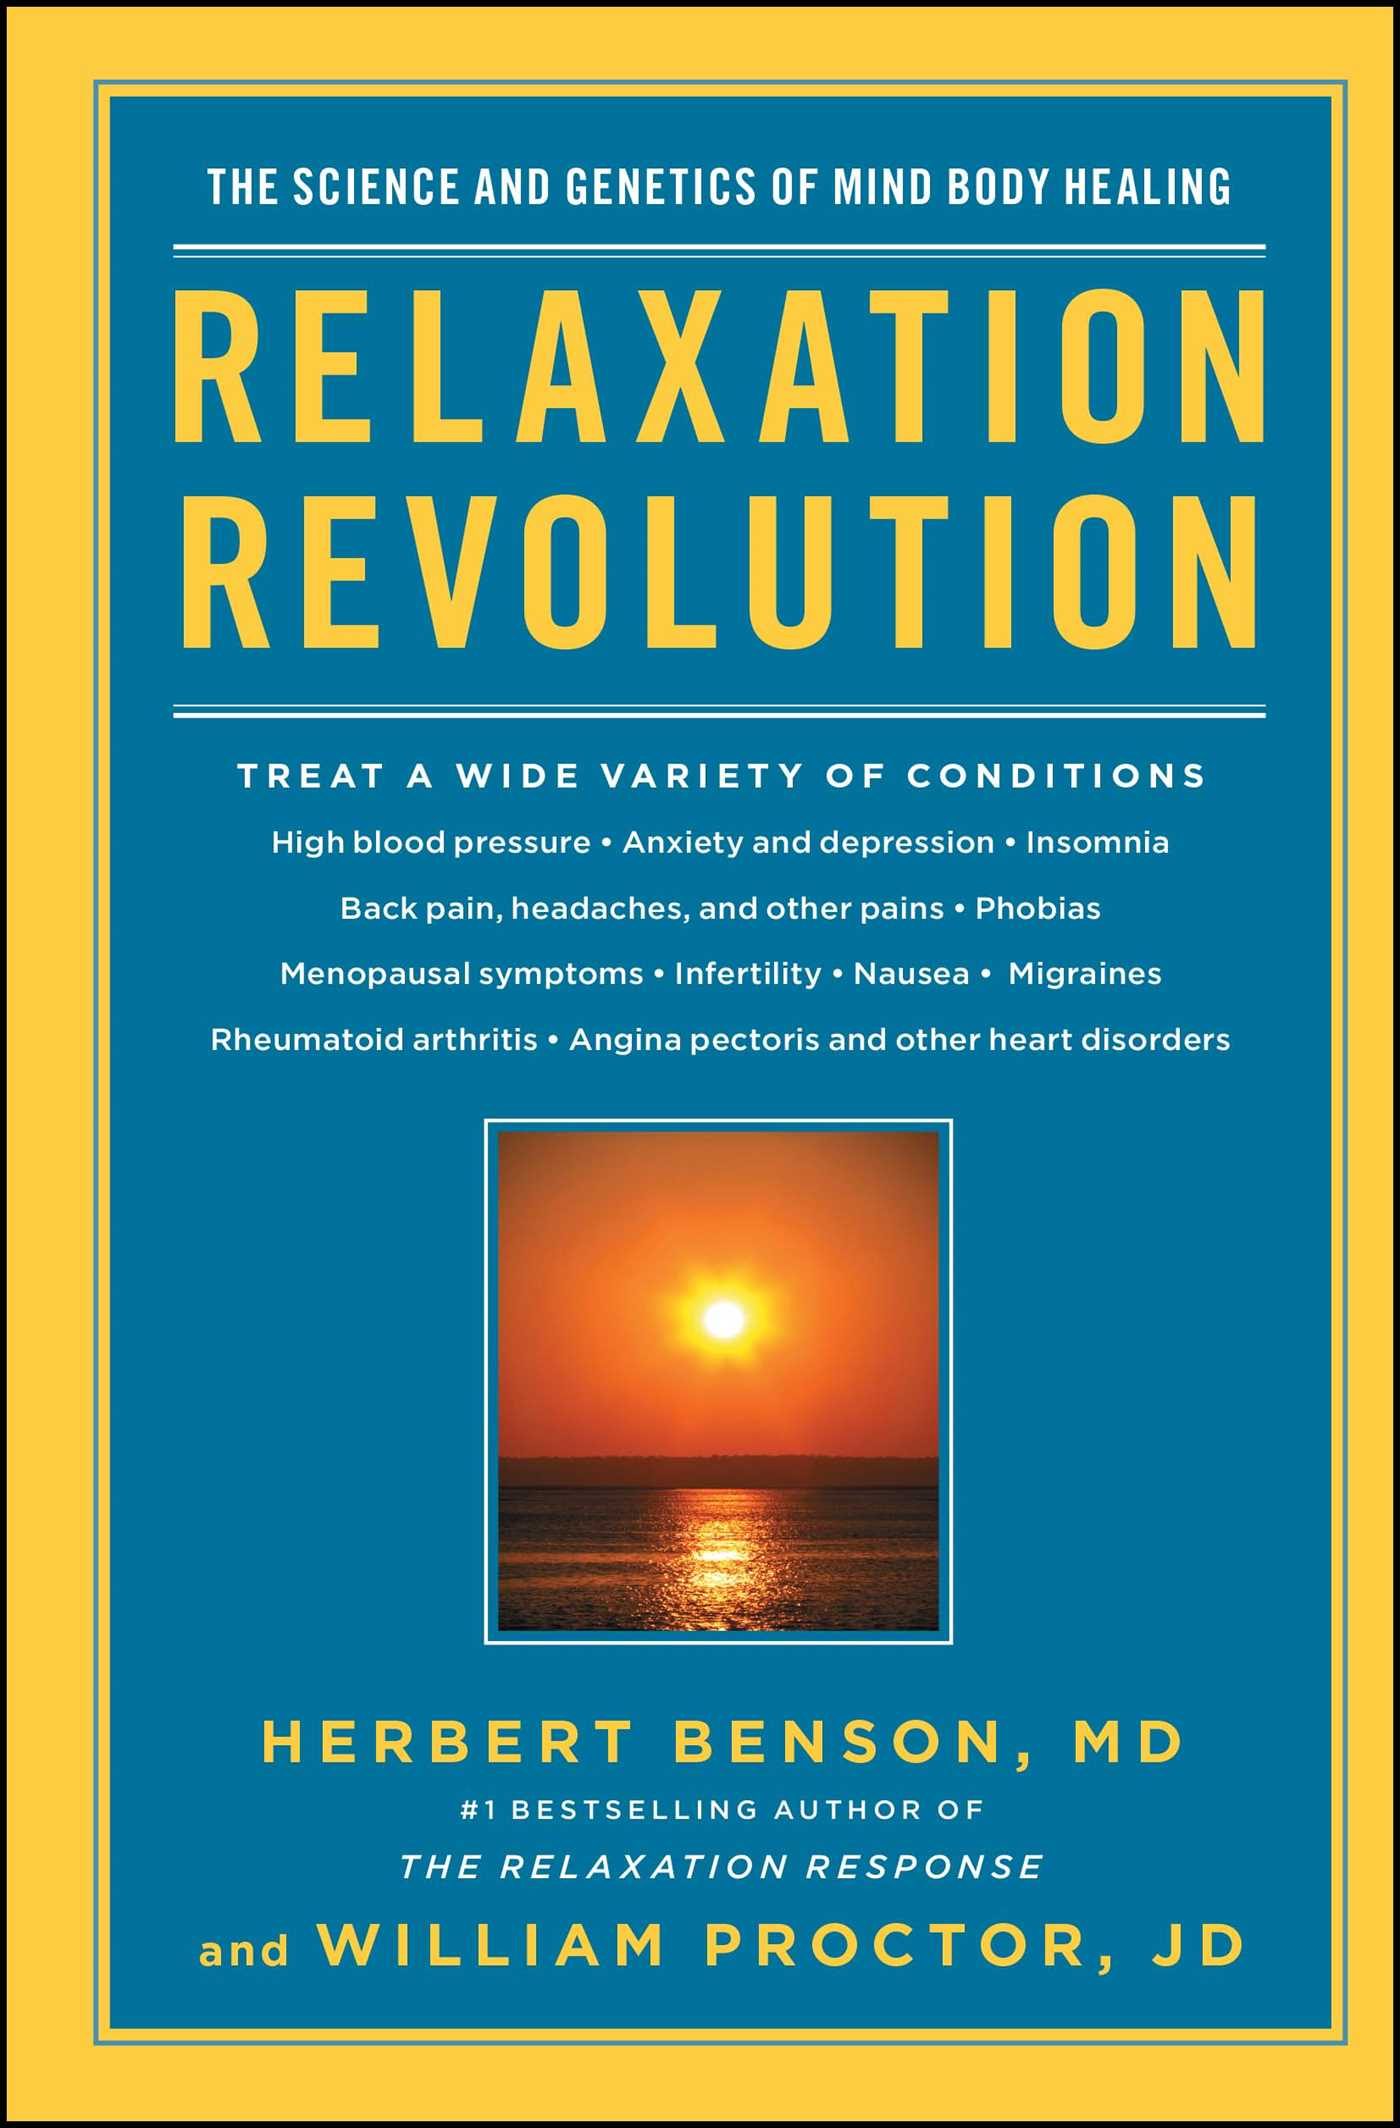 Relaxation revolution 9781439182406 hr